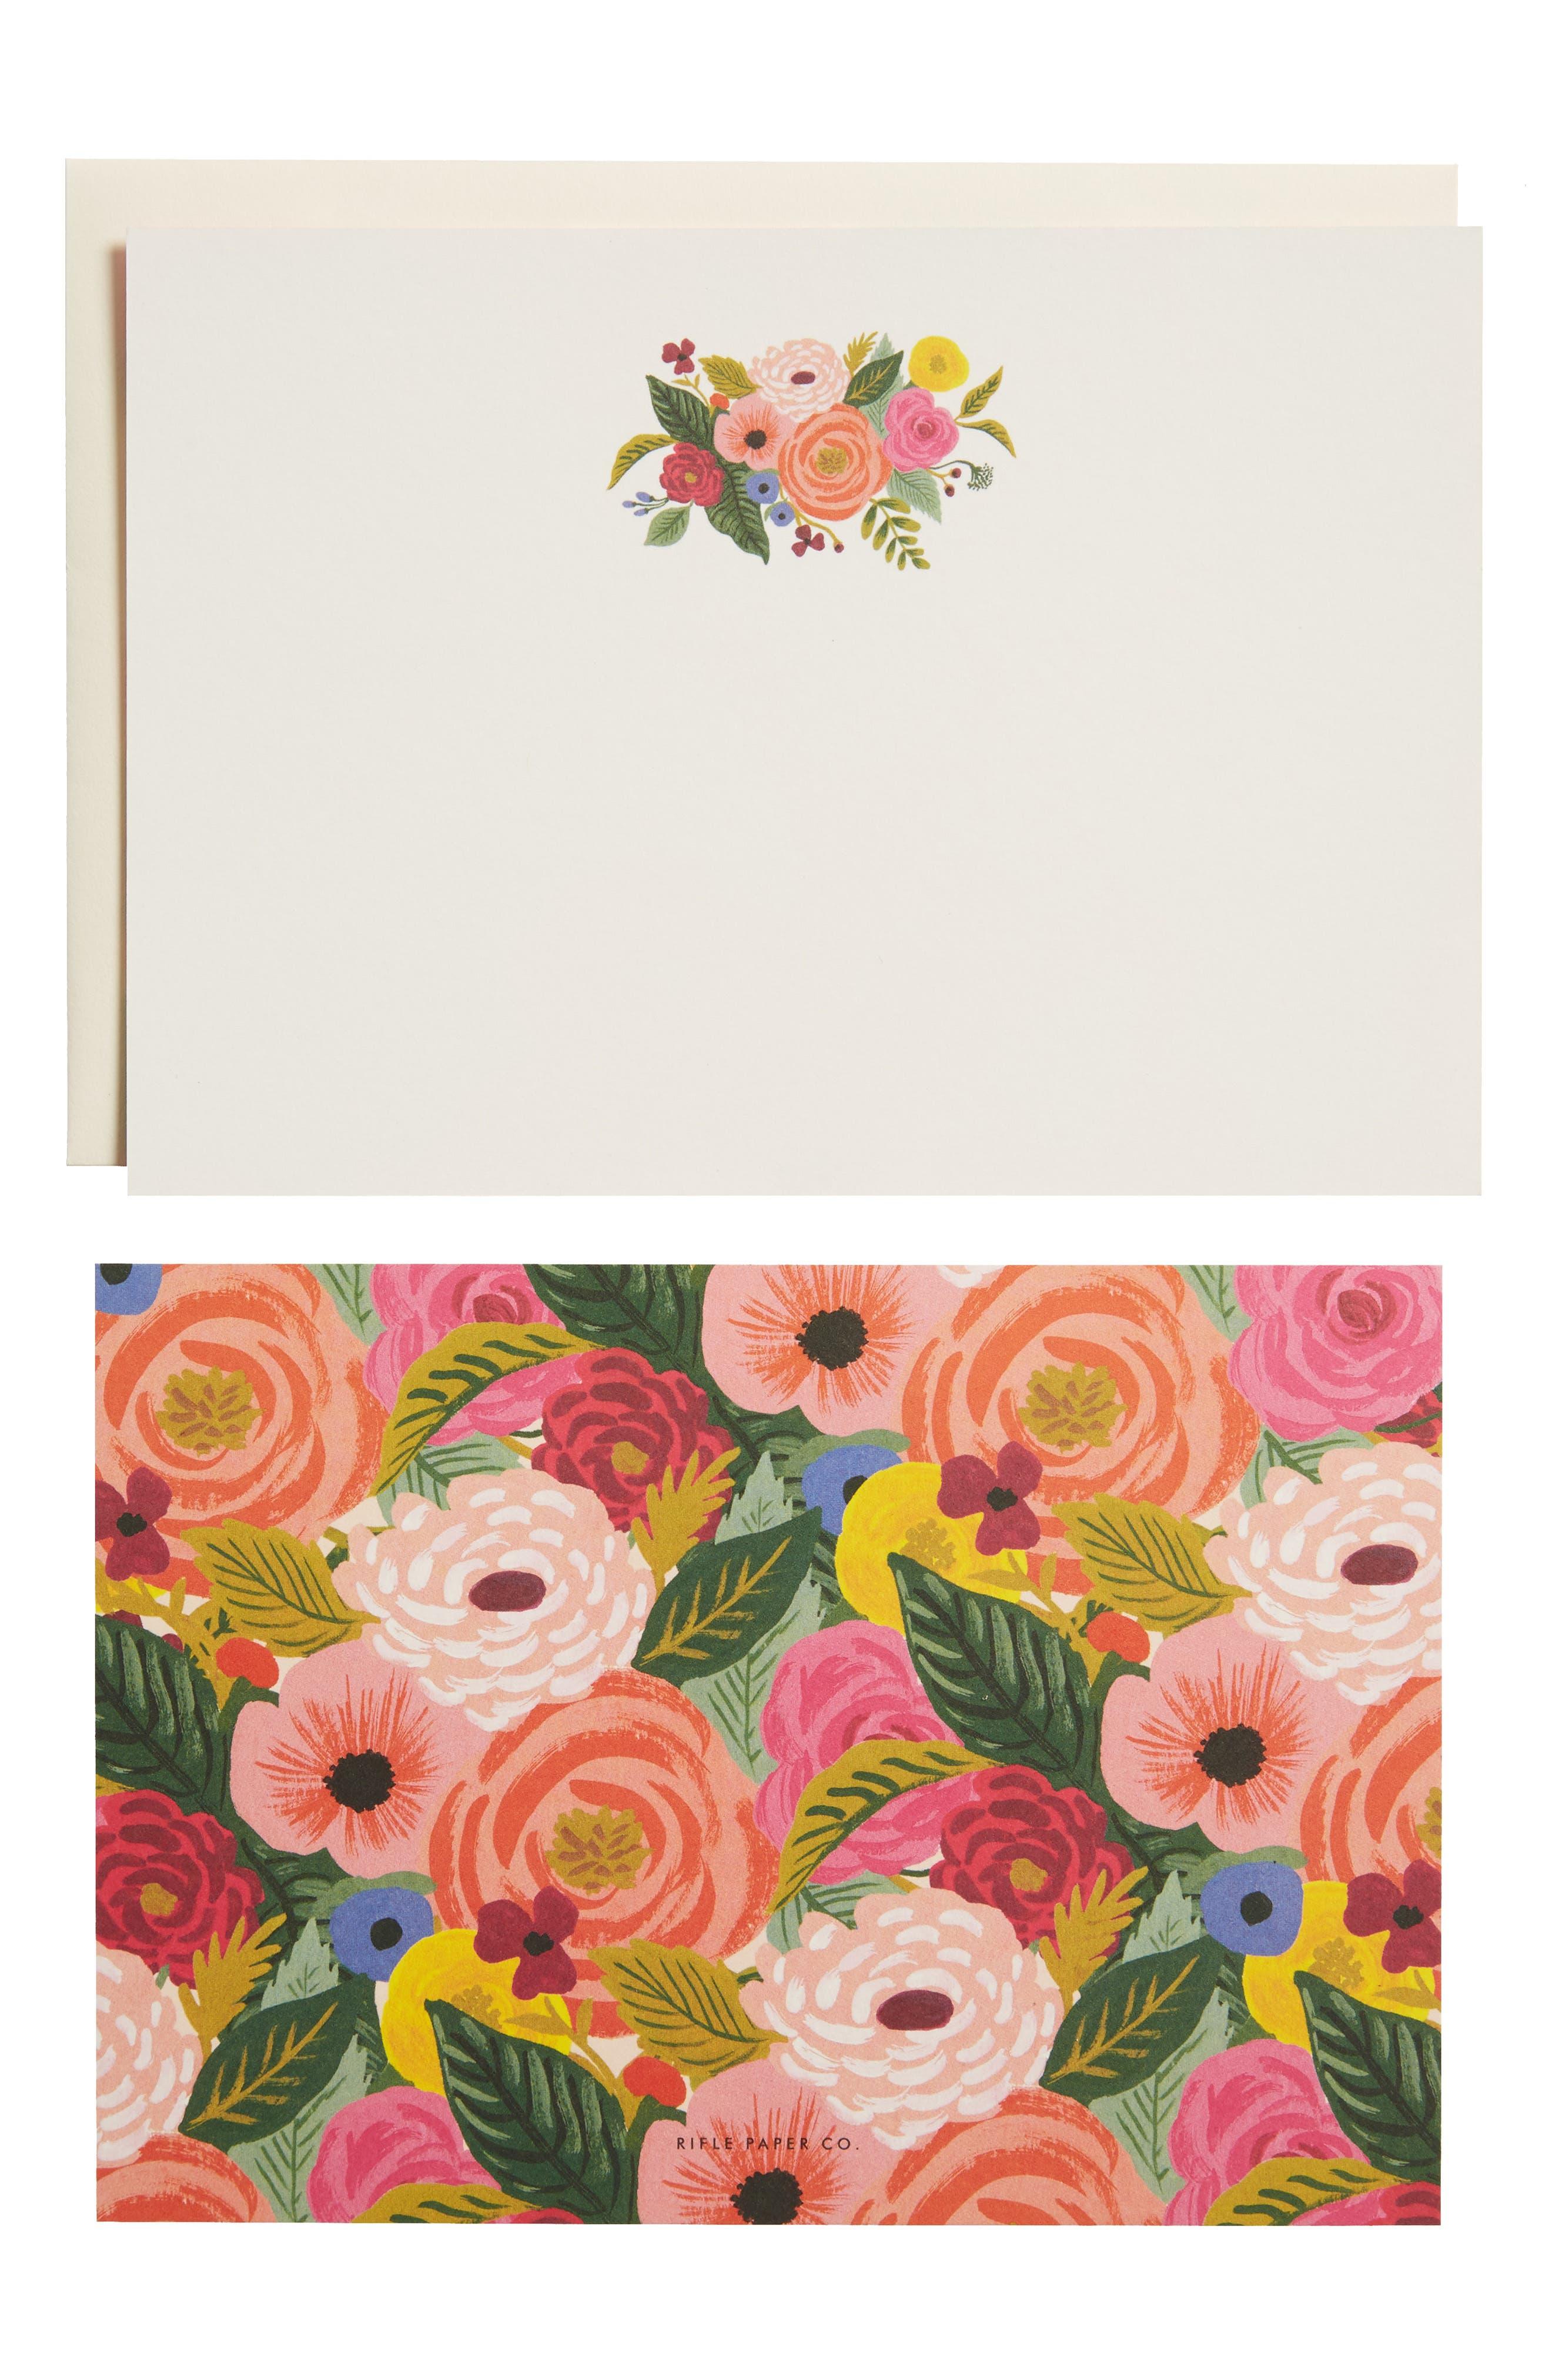 Rifle Paper Co. Juliet Rose Social Stationery 12-Pack Note Cards & Envelopes